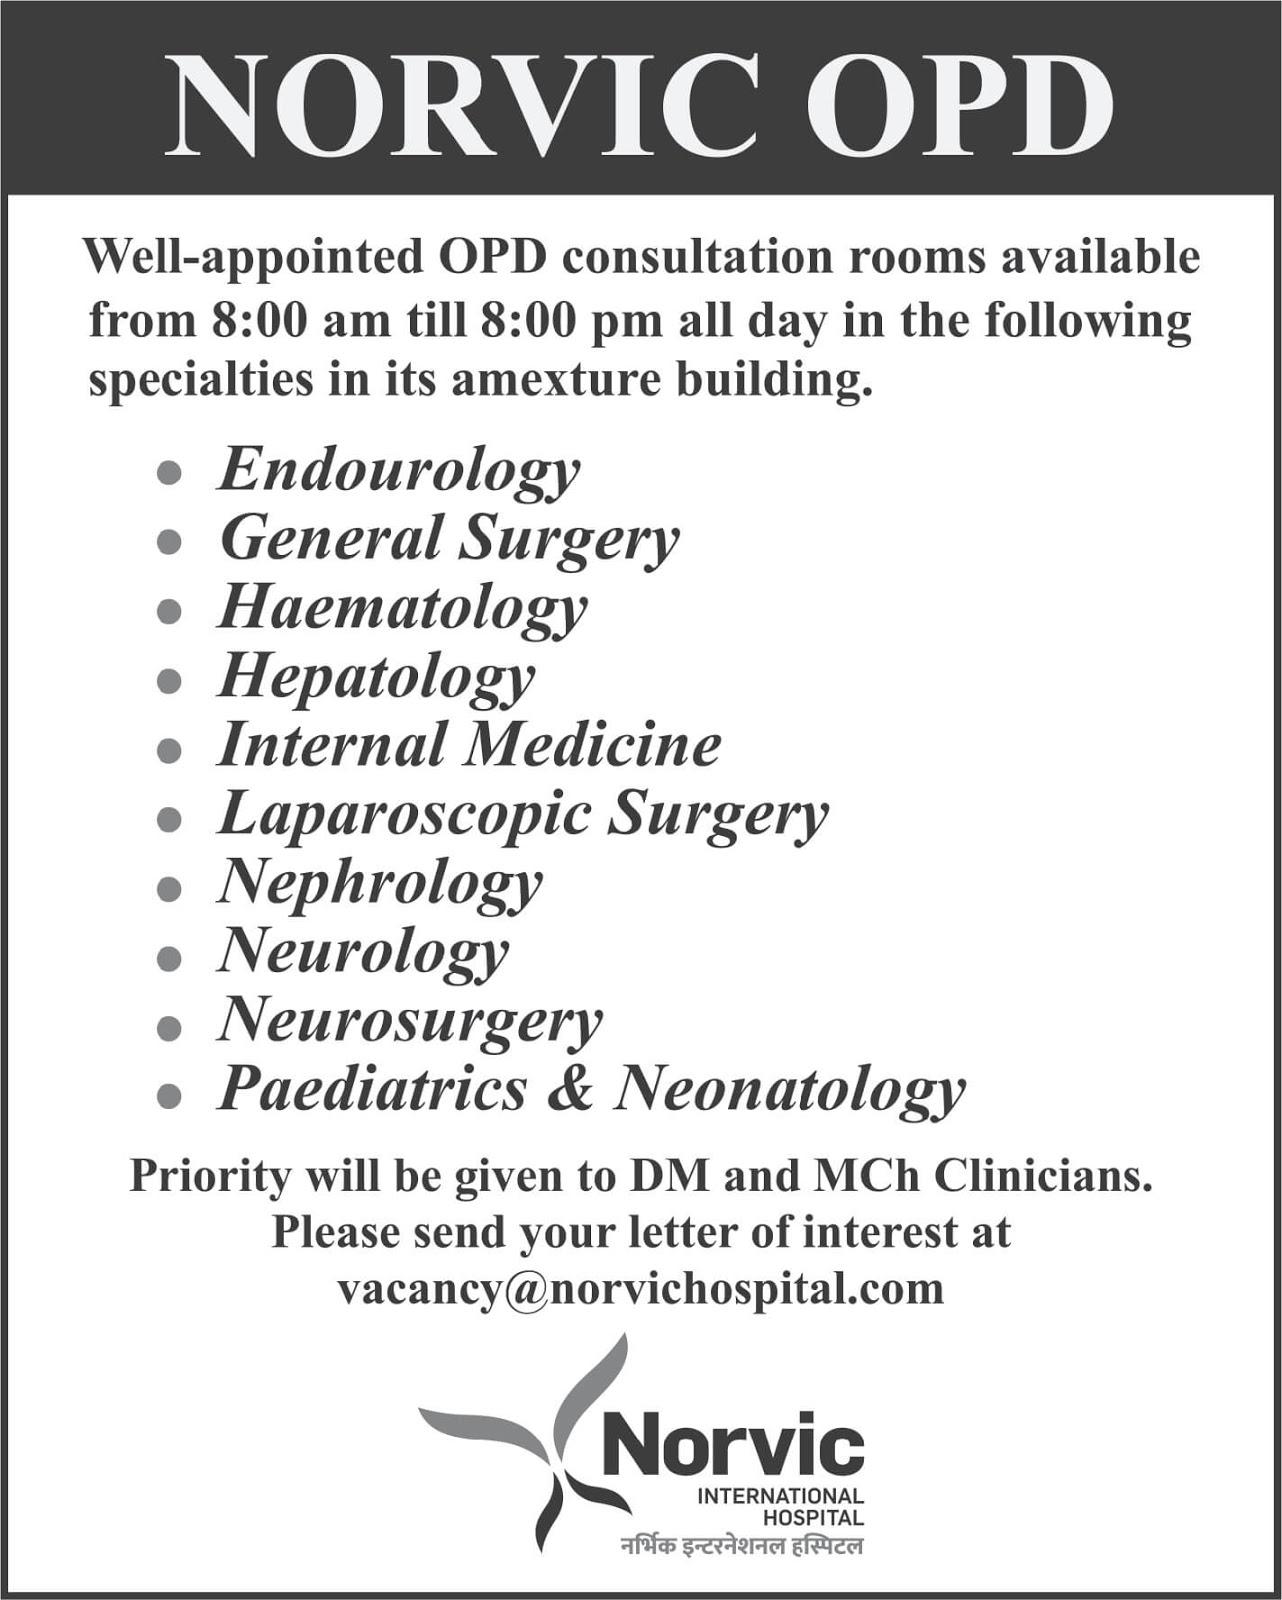 Norvic International Hospital Job Vacancy